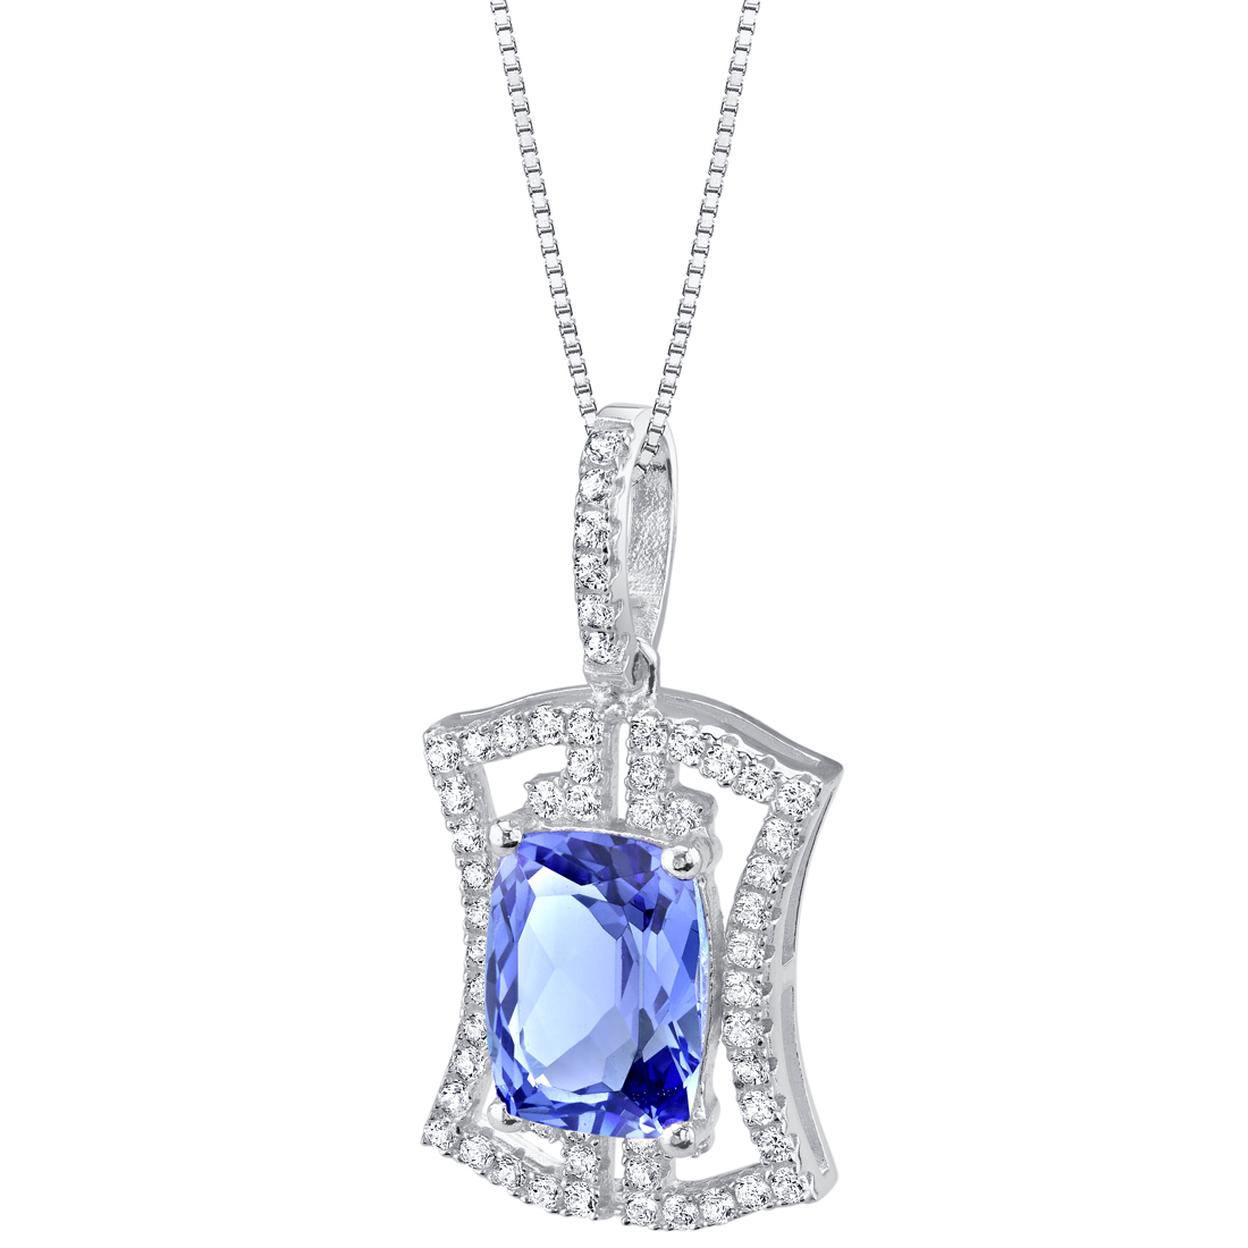 Simulated Tanzanite Sterling Silver Art Deco Pendant Necklace